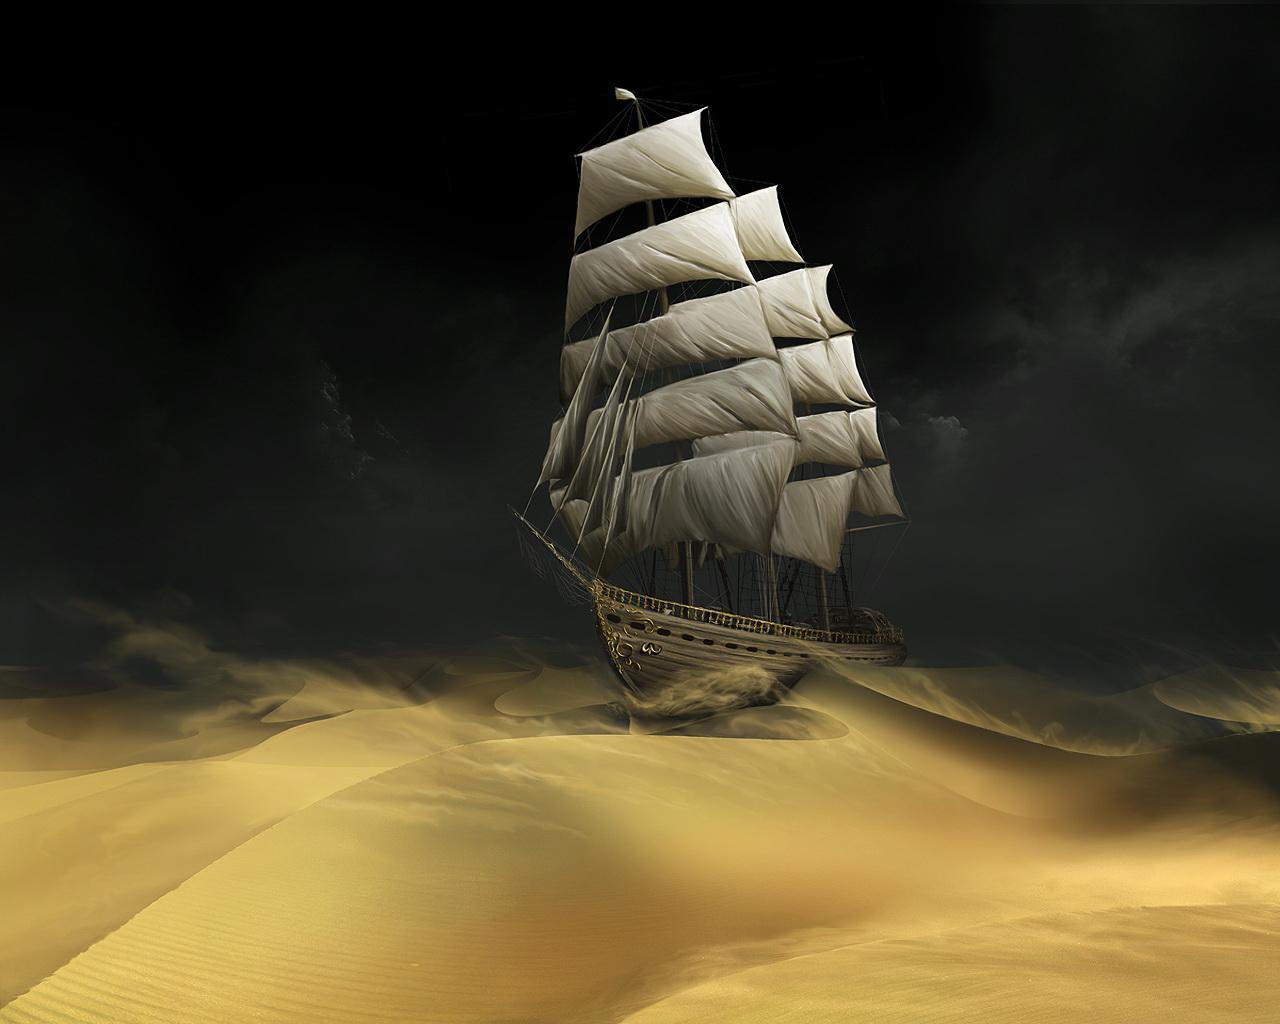 http://www.zastavki.com/pictures/1280x1024/2009/Drawn_wallpapers_Desert_sailboat_013596_.jpg